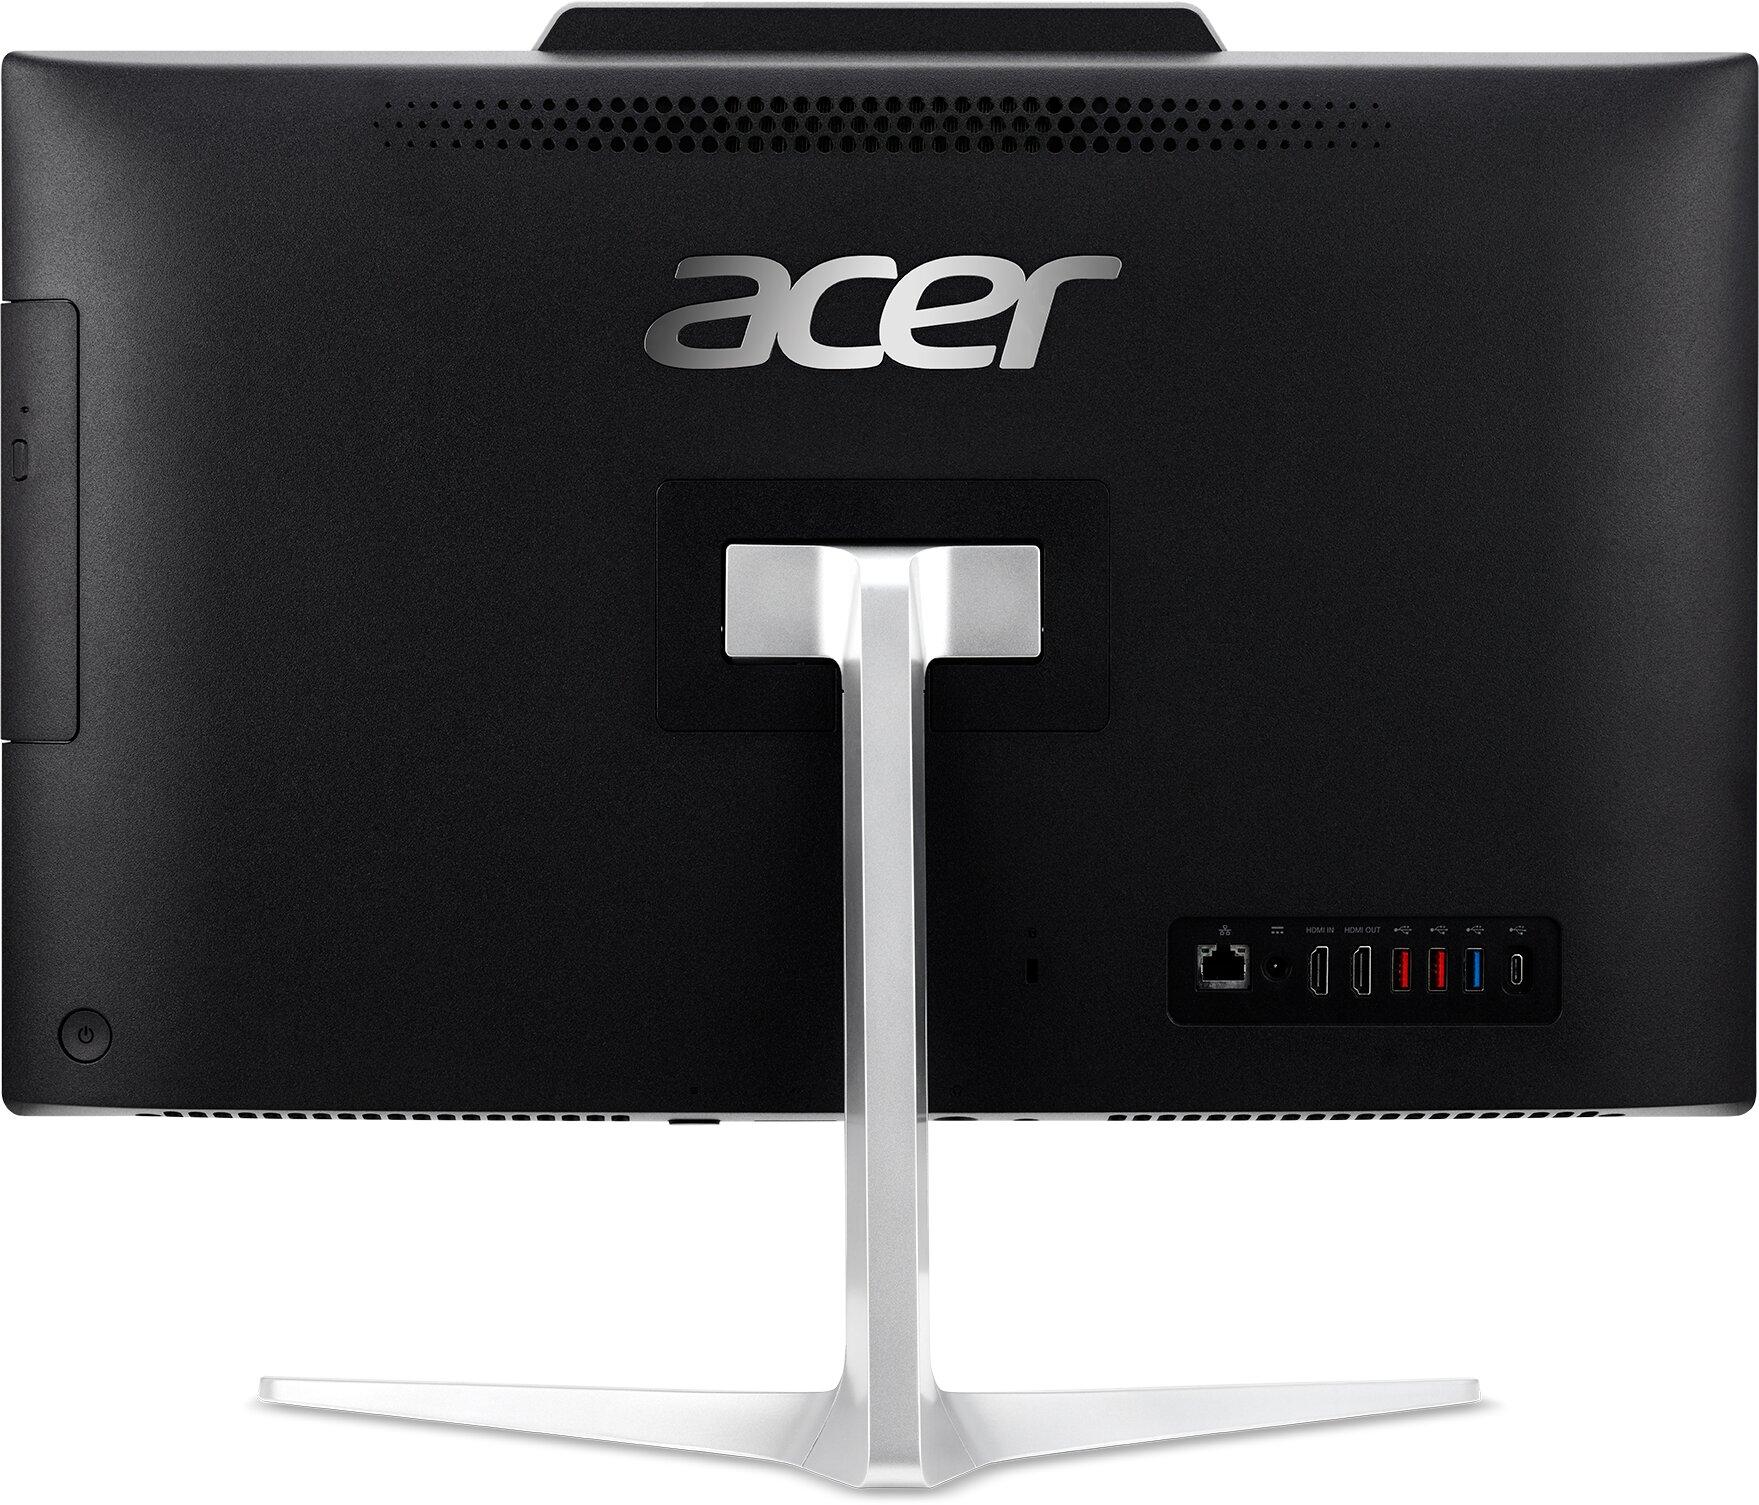 Acer Aspire Z24-890 AiO